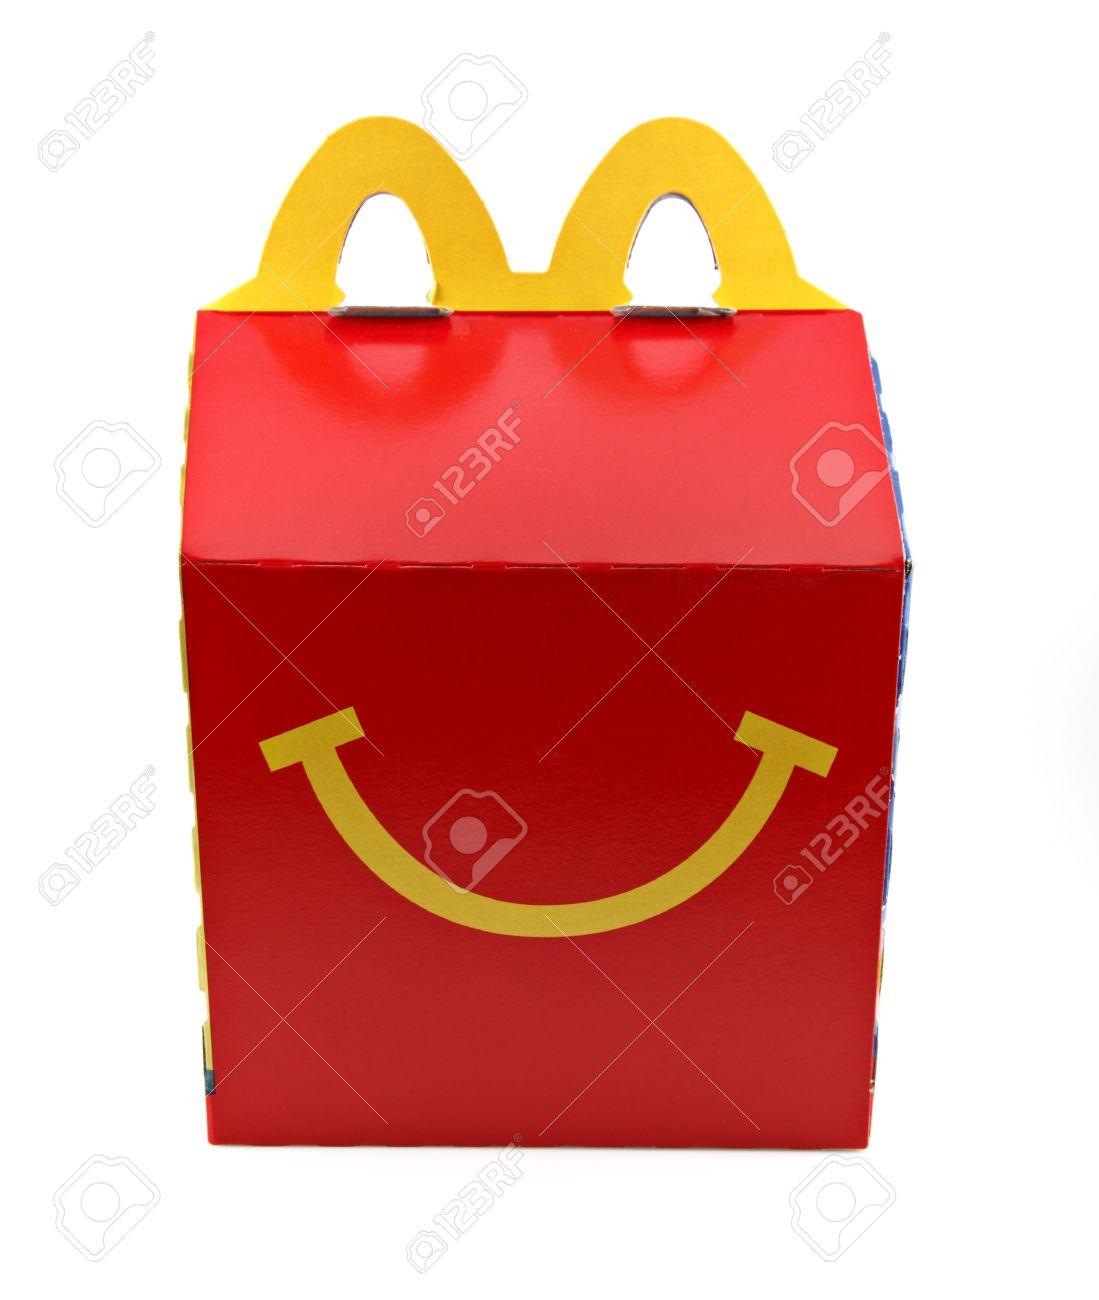 happy meal box elita aisushi co